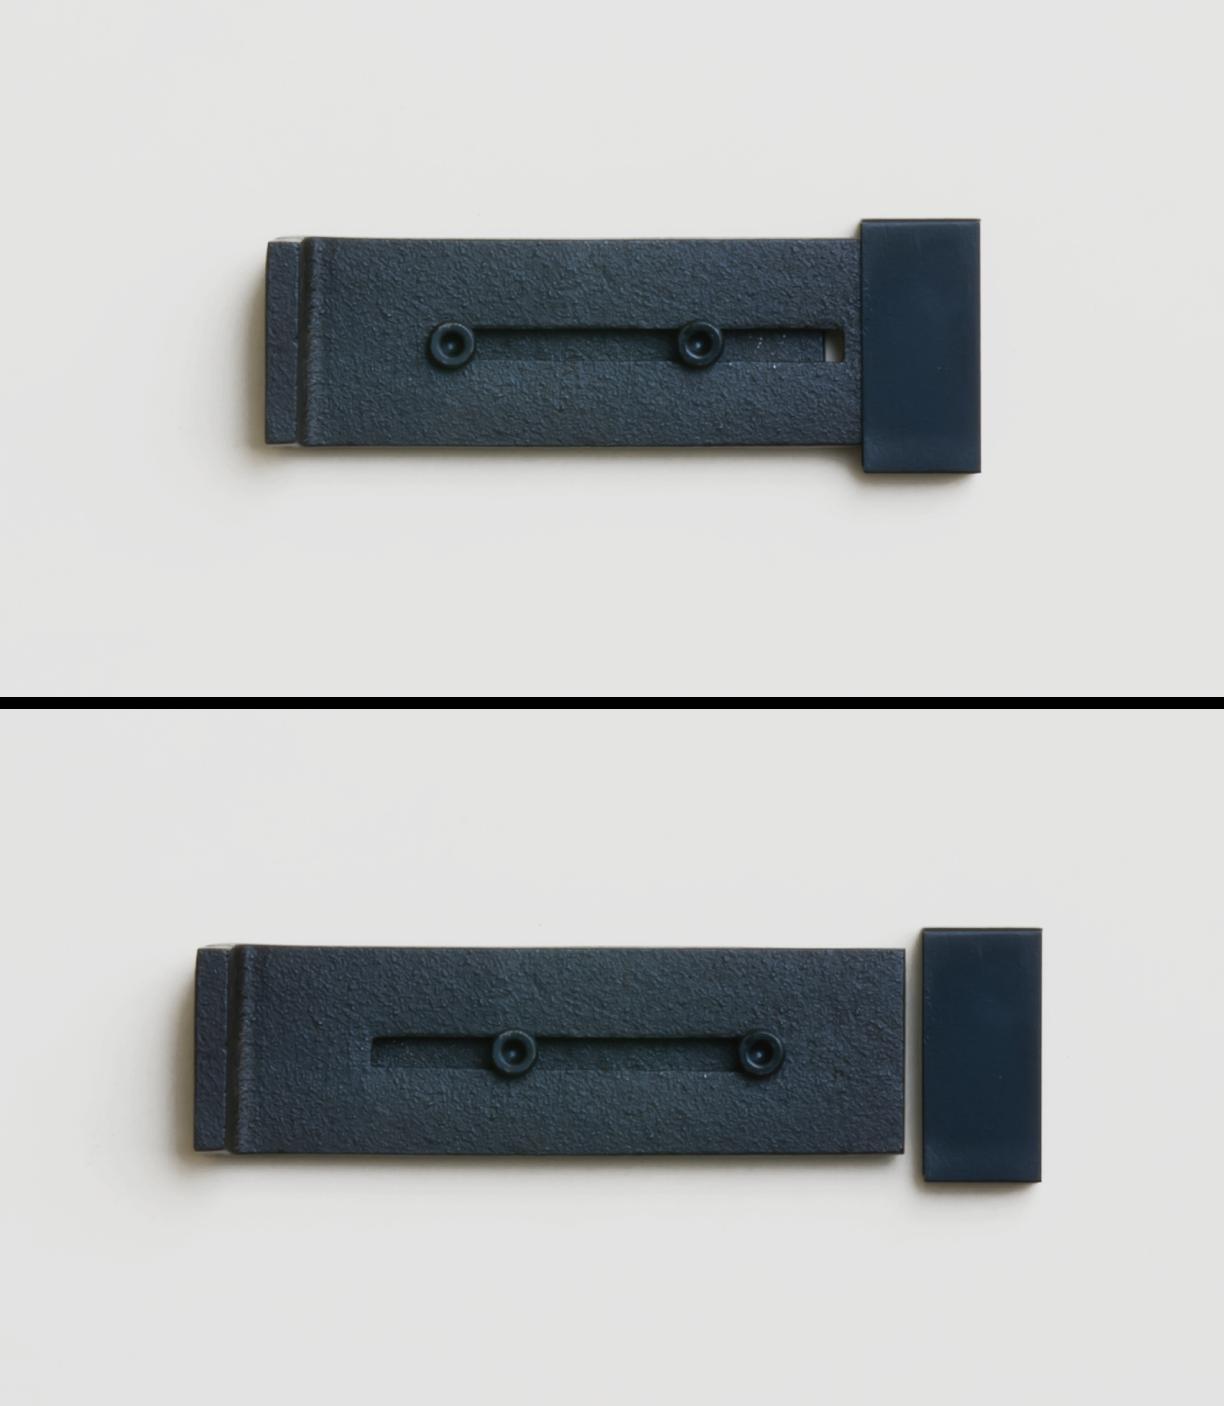 ACTP 08 引戸用鍵